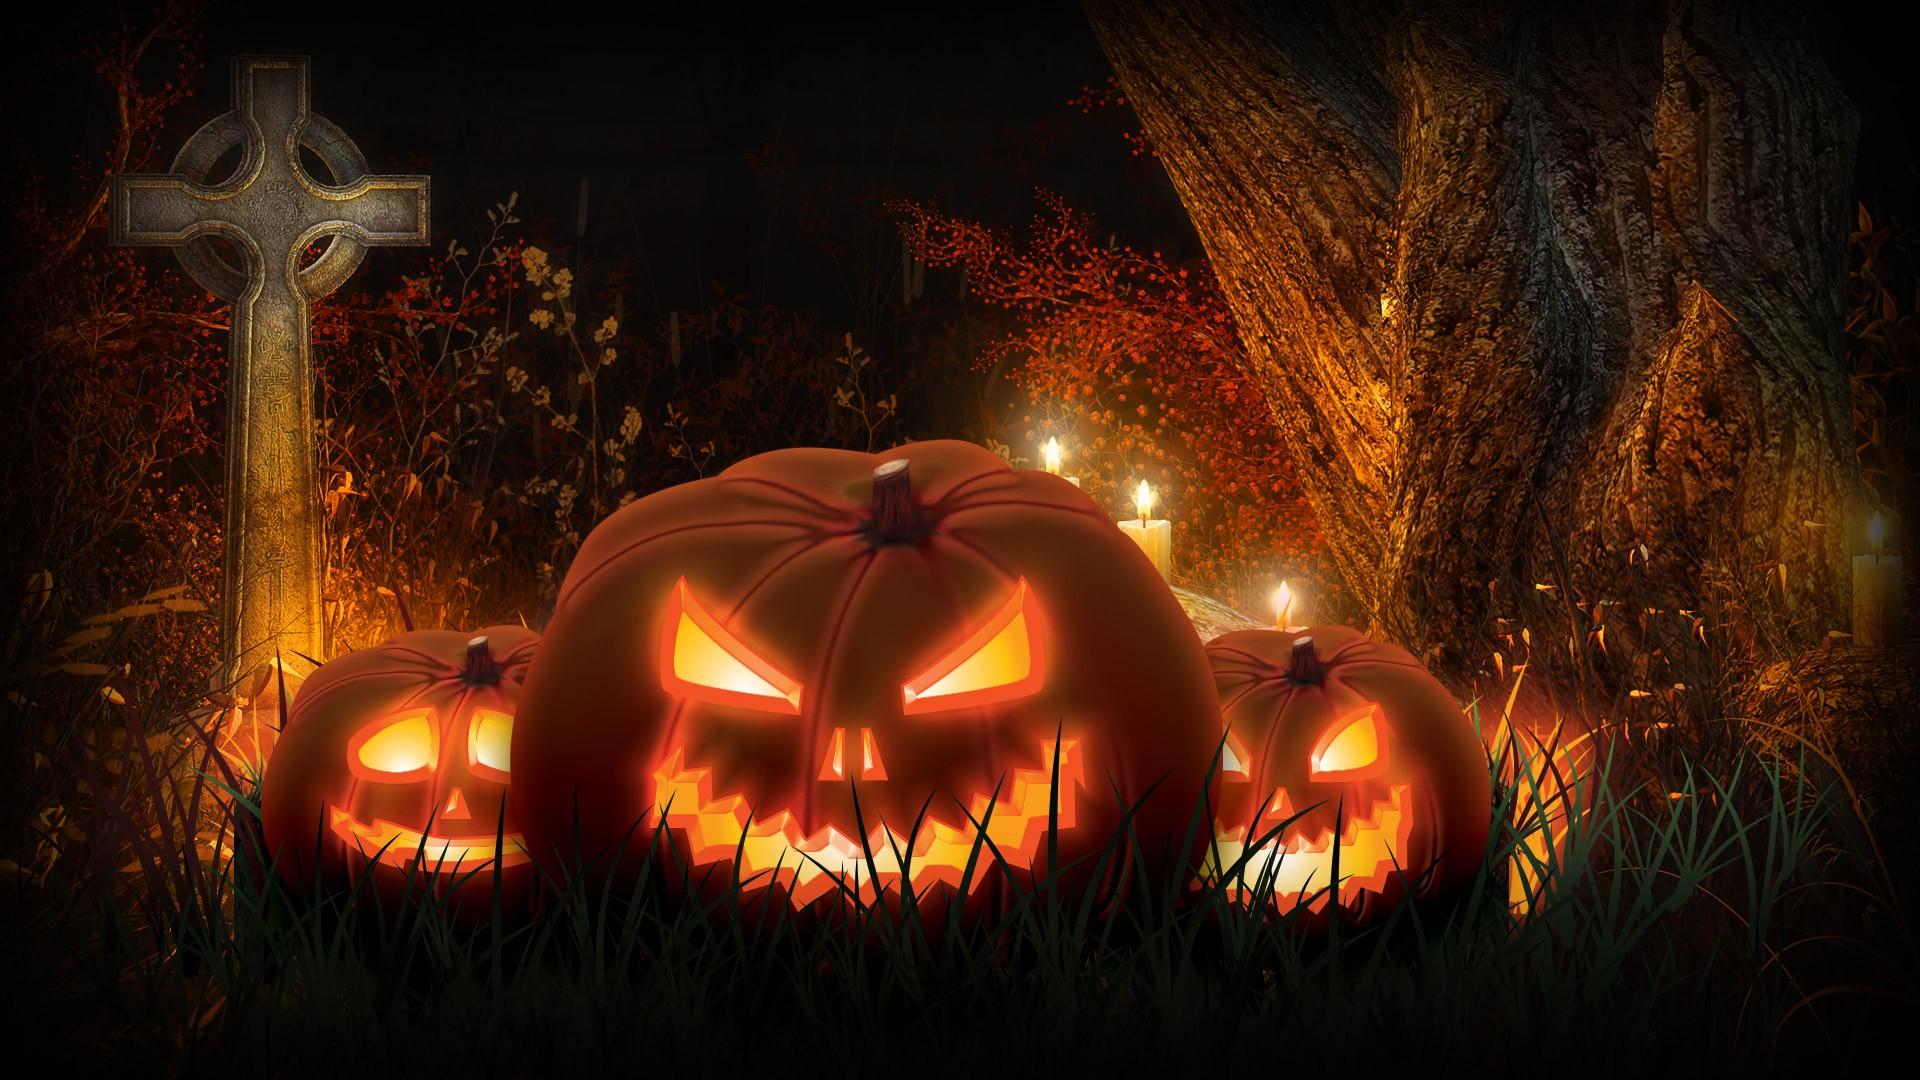 Halloween Scary Spooky Cemetery Pumpkins Wallpaper